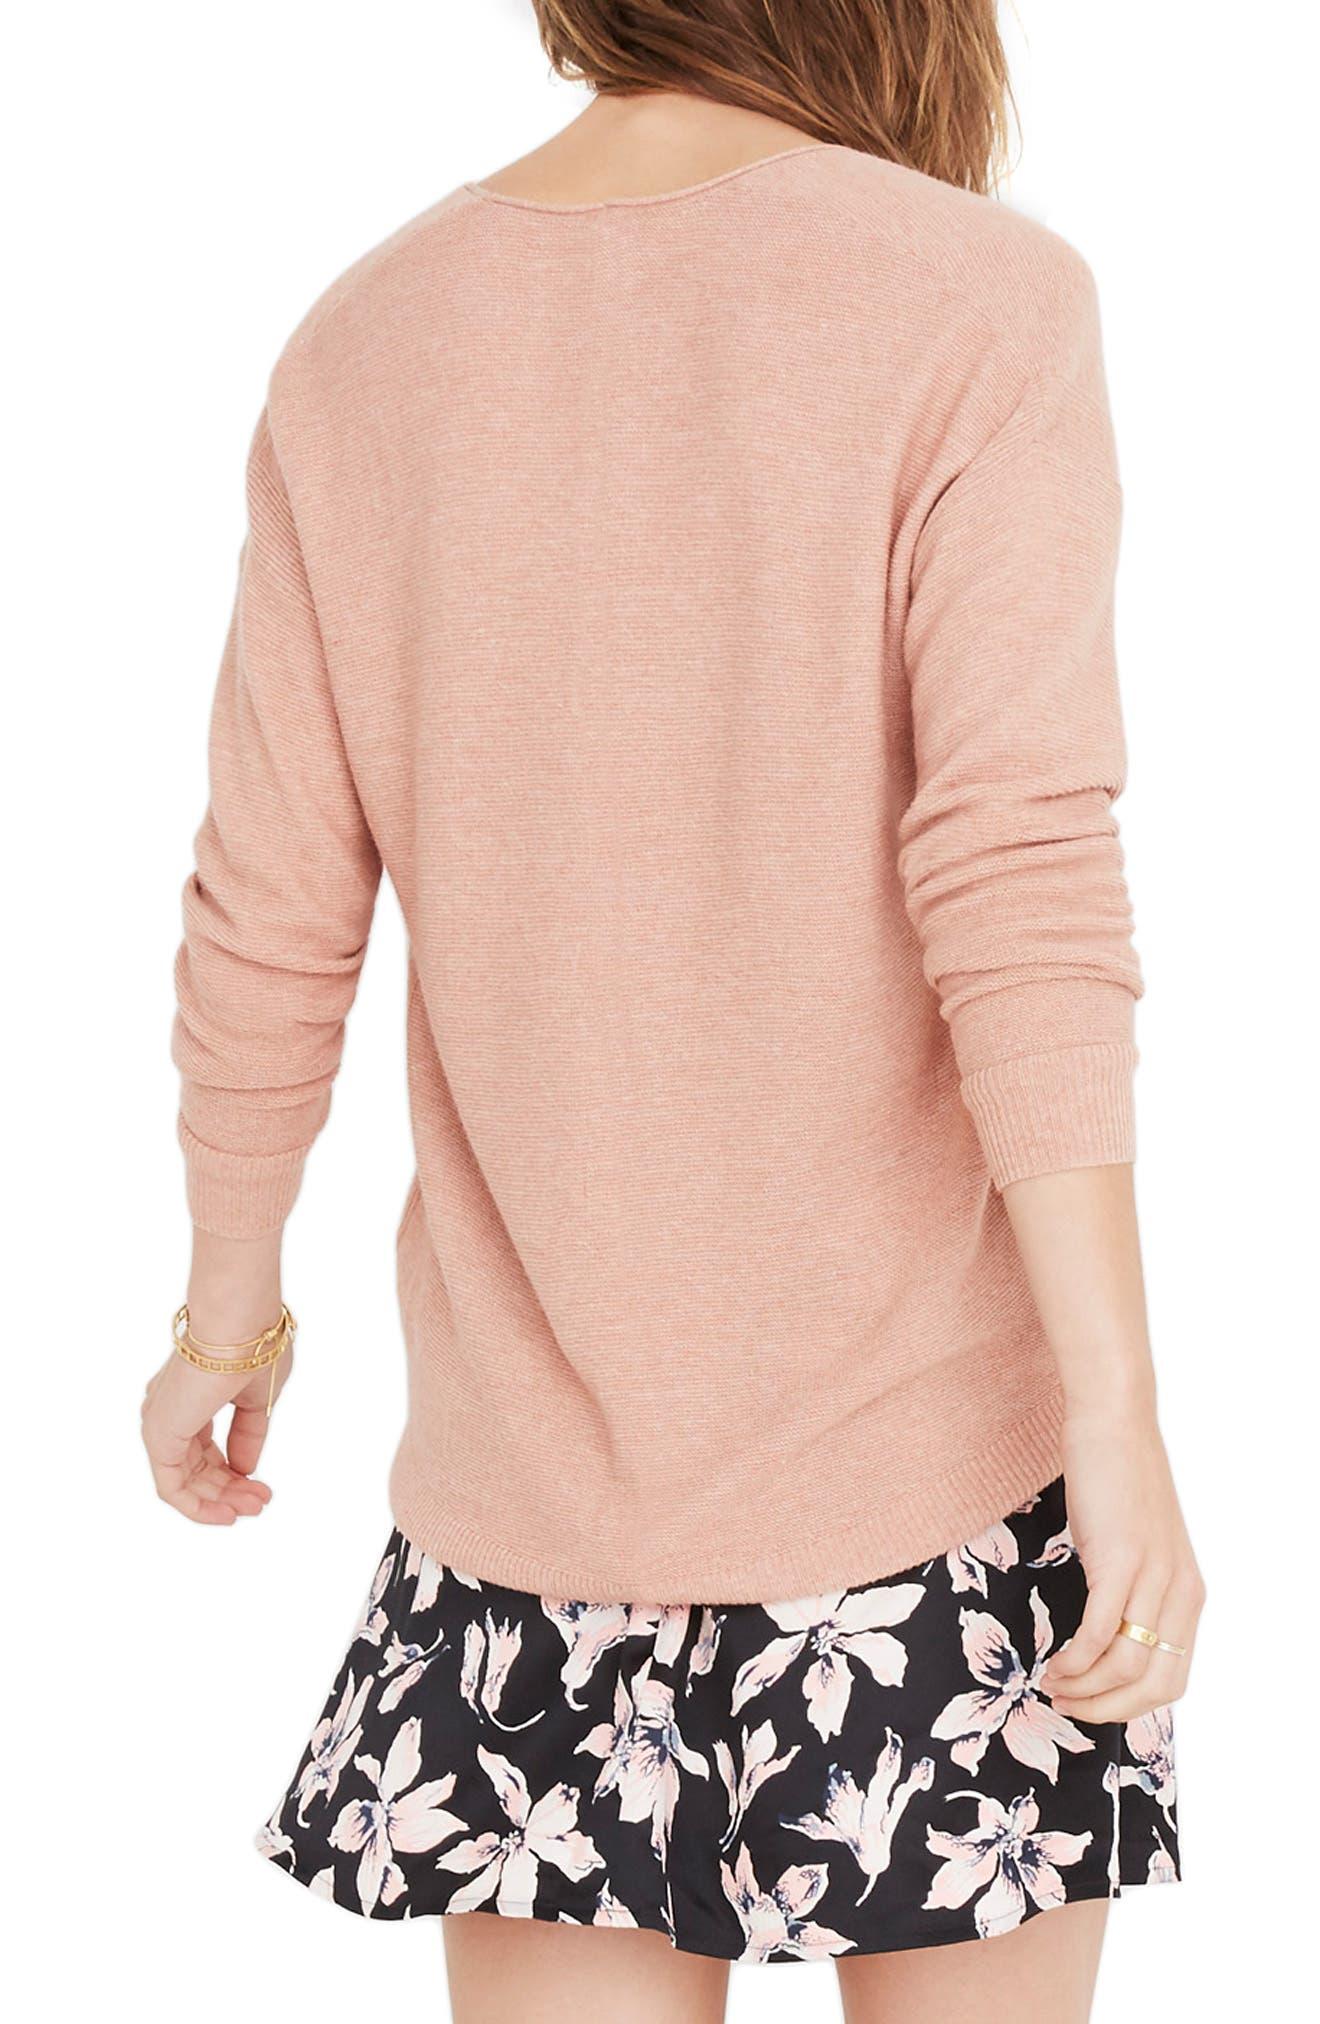 Kimball Sweater,                             Alternate thumbnail 2, color,                             HEATHER ROSE